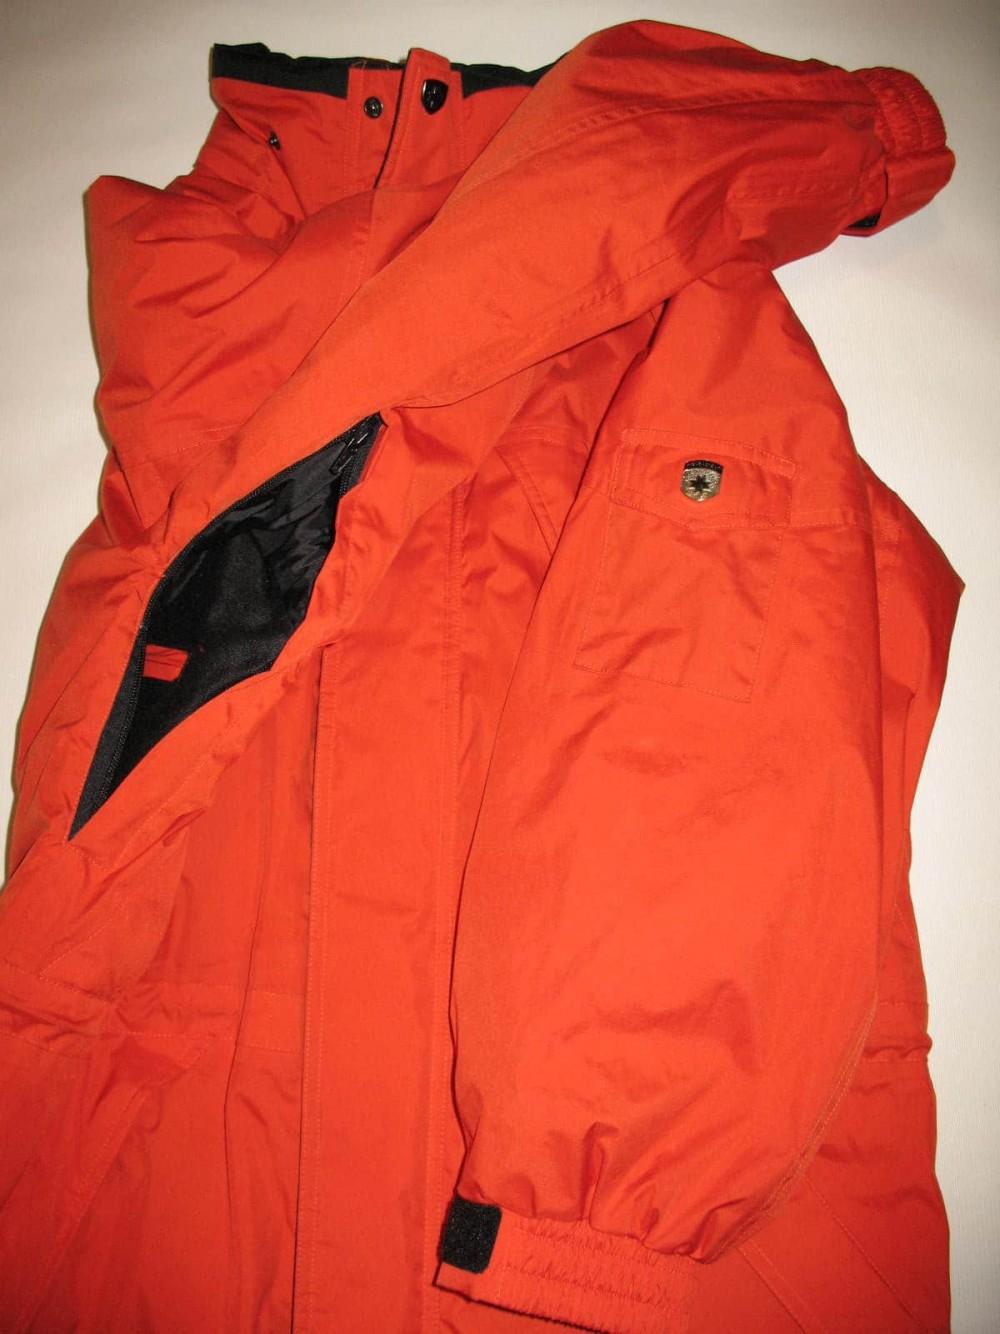 Куртка WELLENSTEYN brandungsparka jacket (размер S/M) - 13